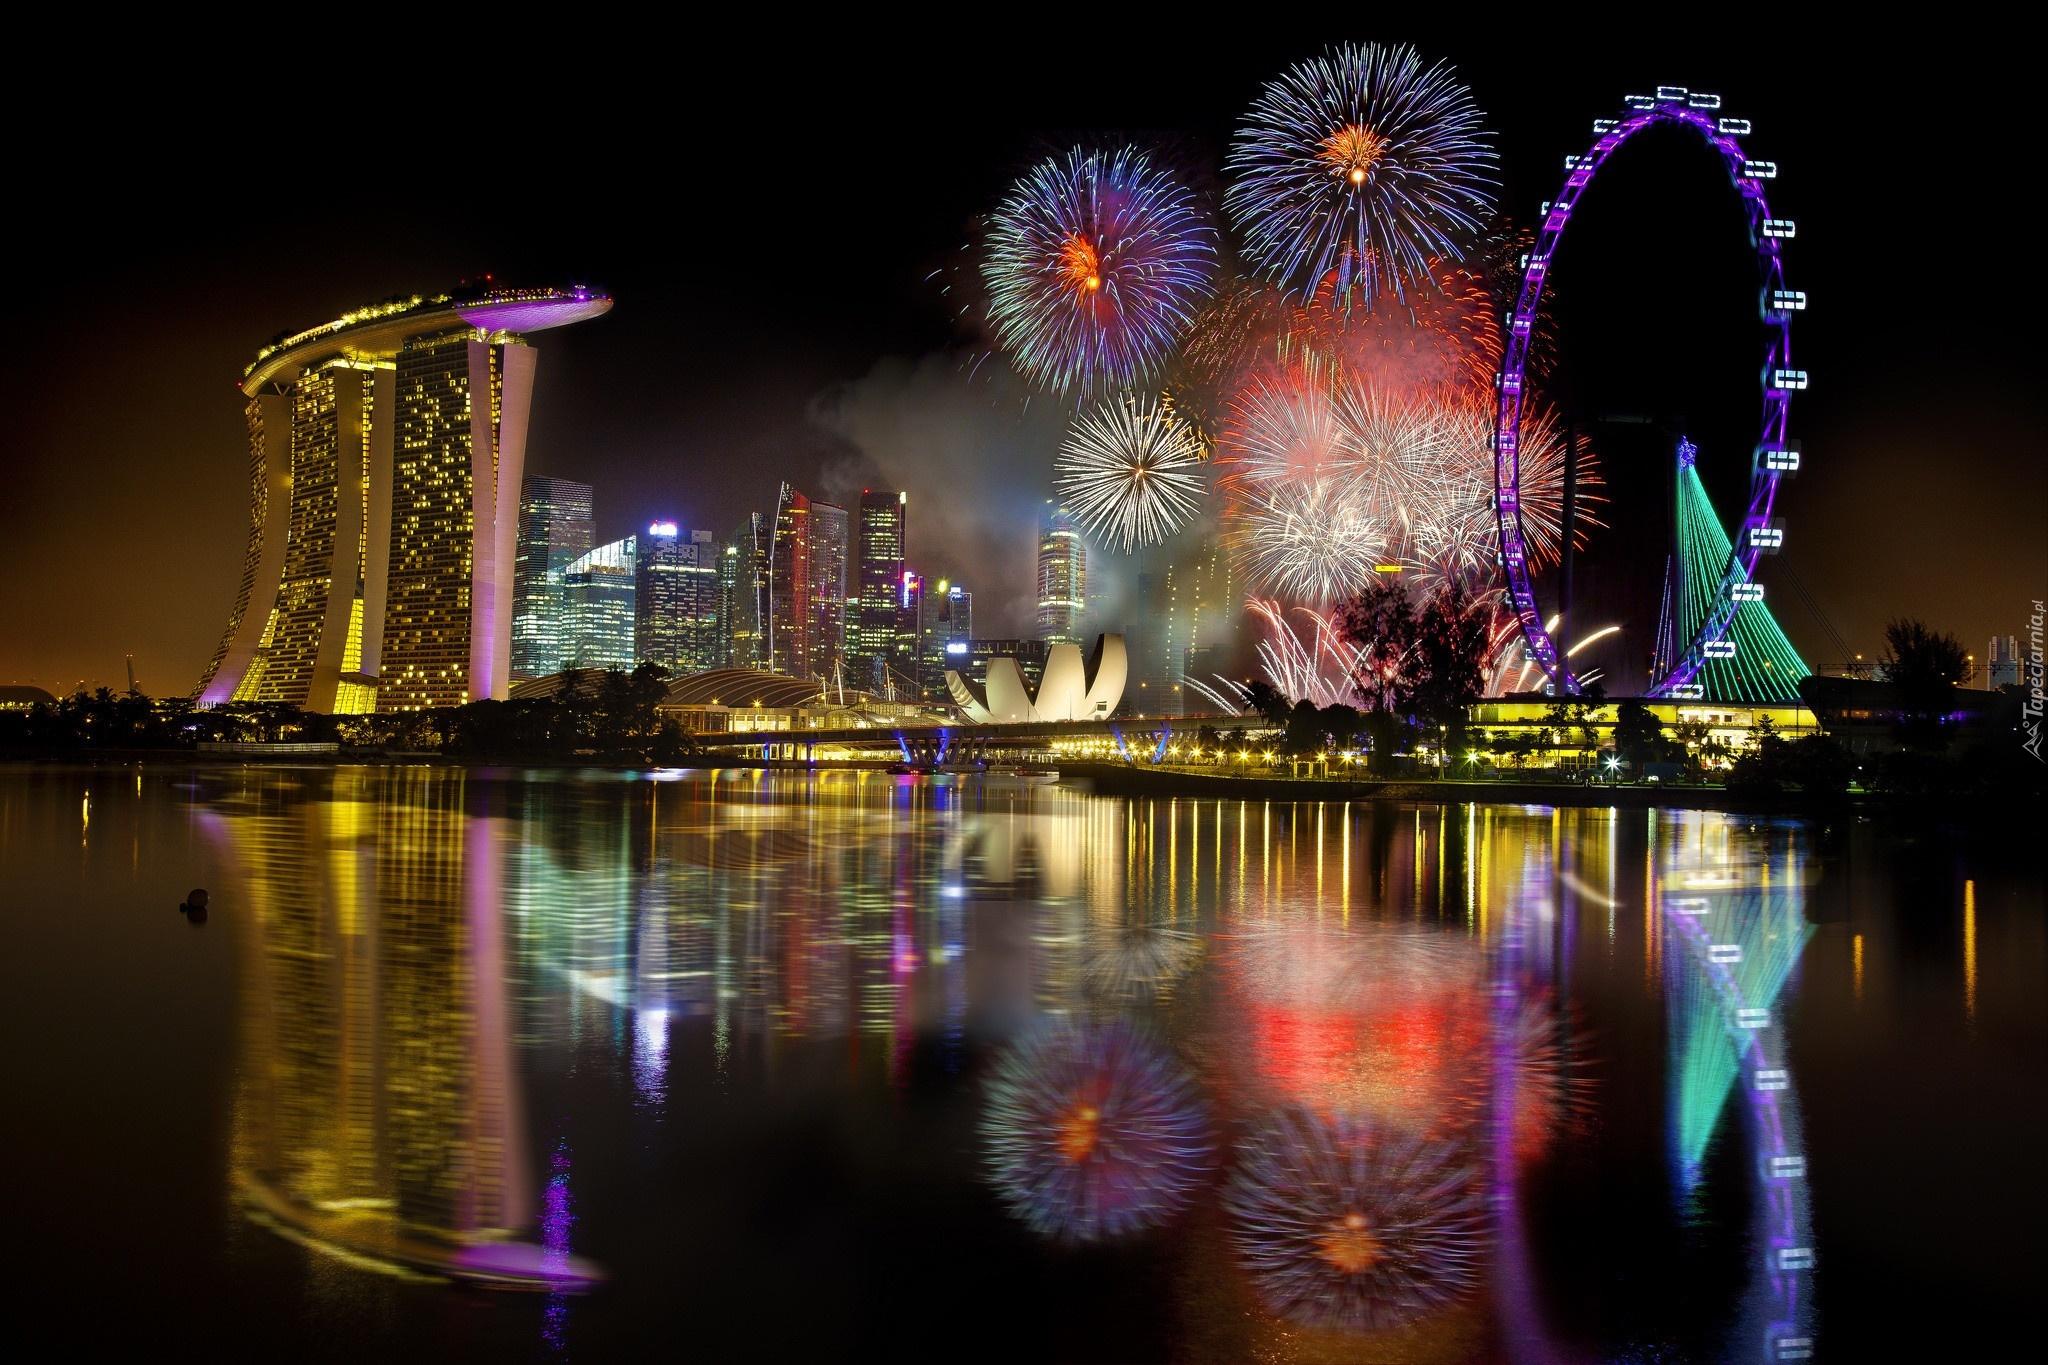 Singapur, Noc, Karuzela, Fajerwerki, Zatoka, Hotel Marina ...